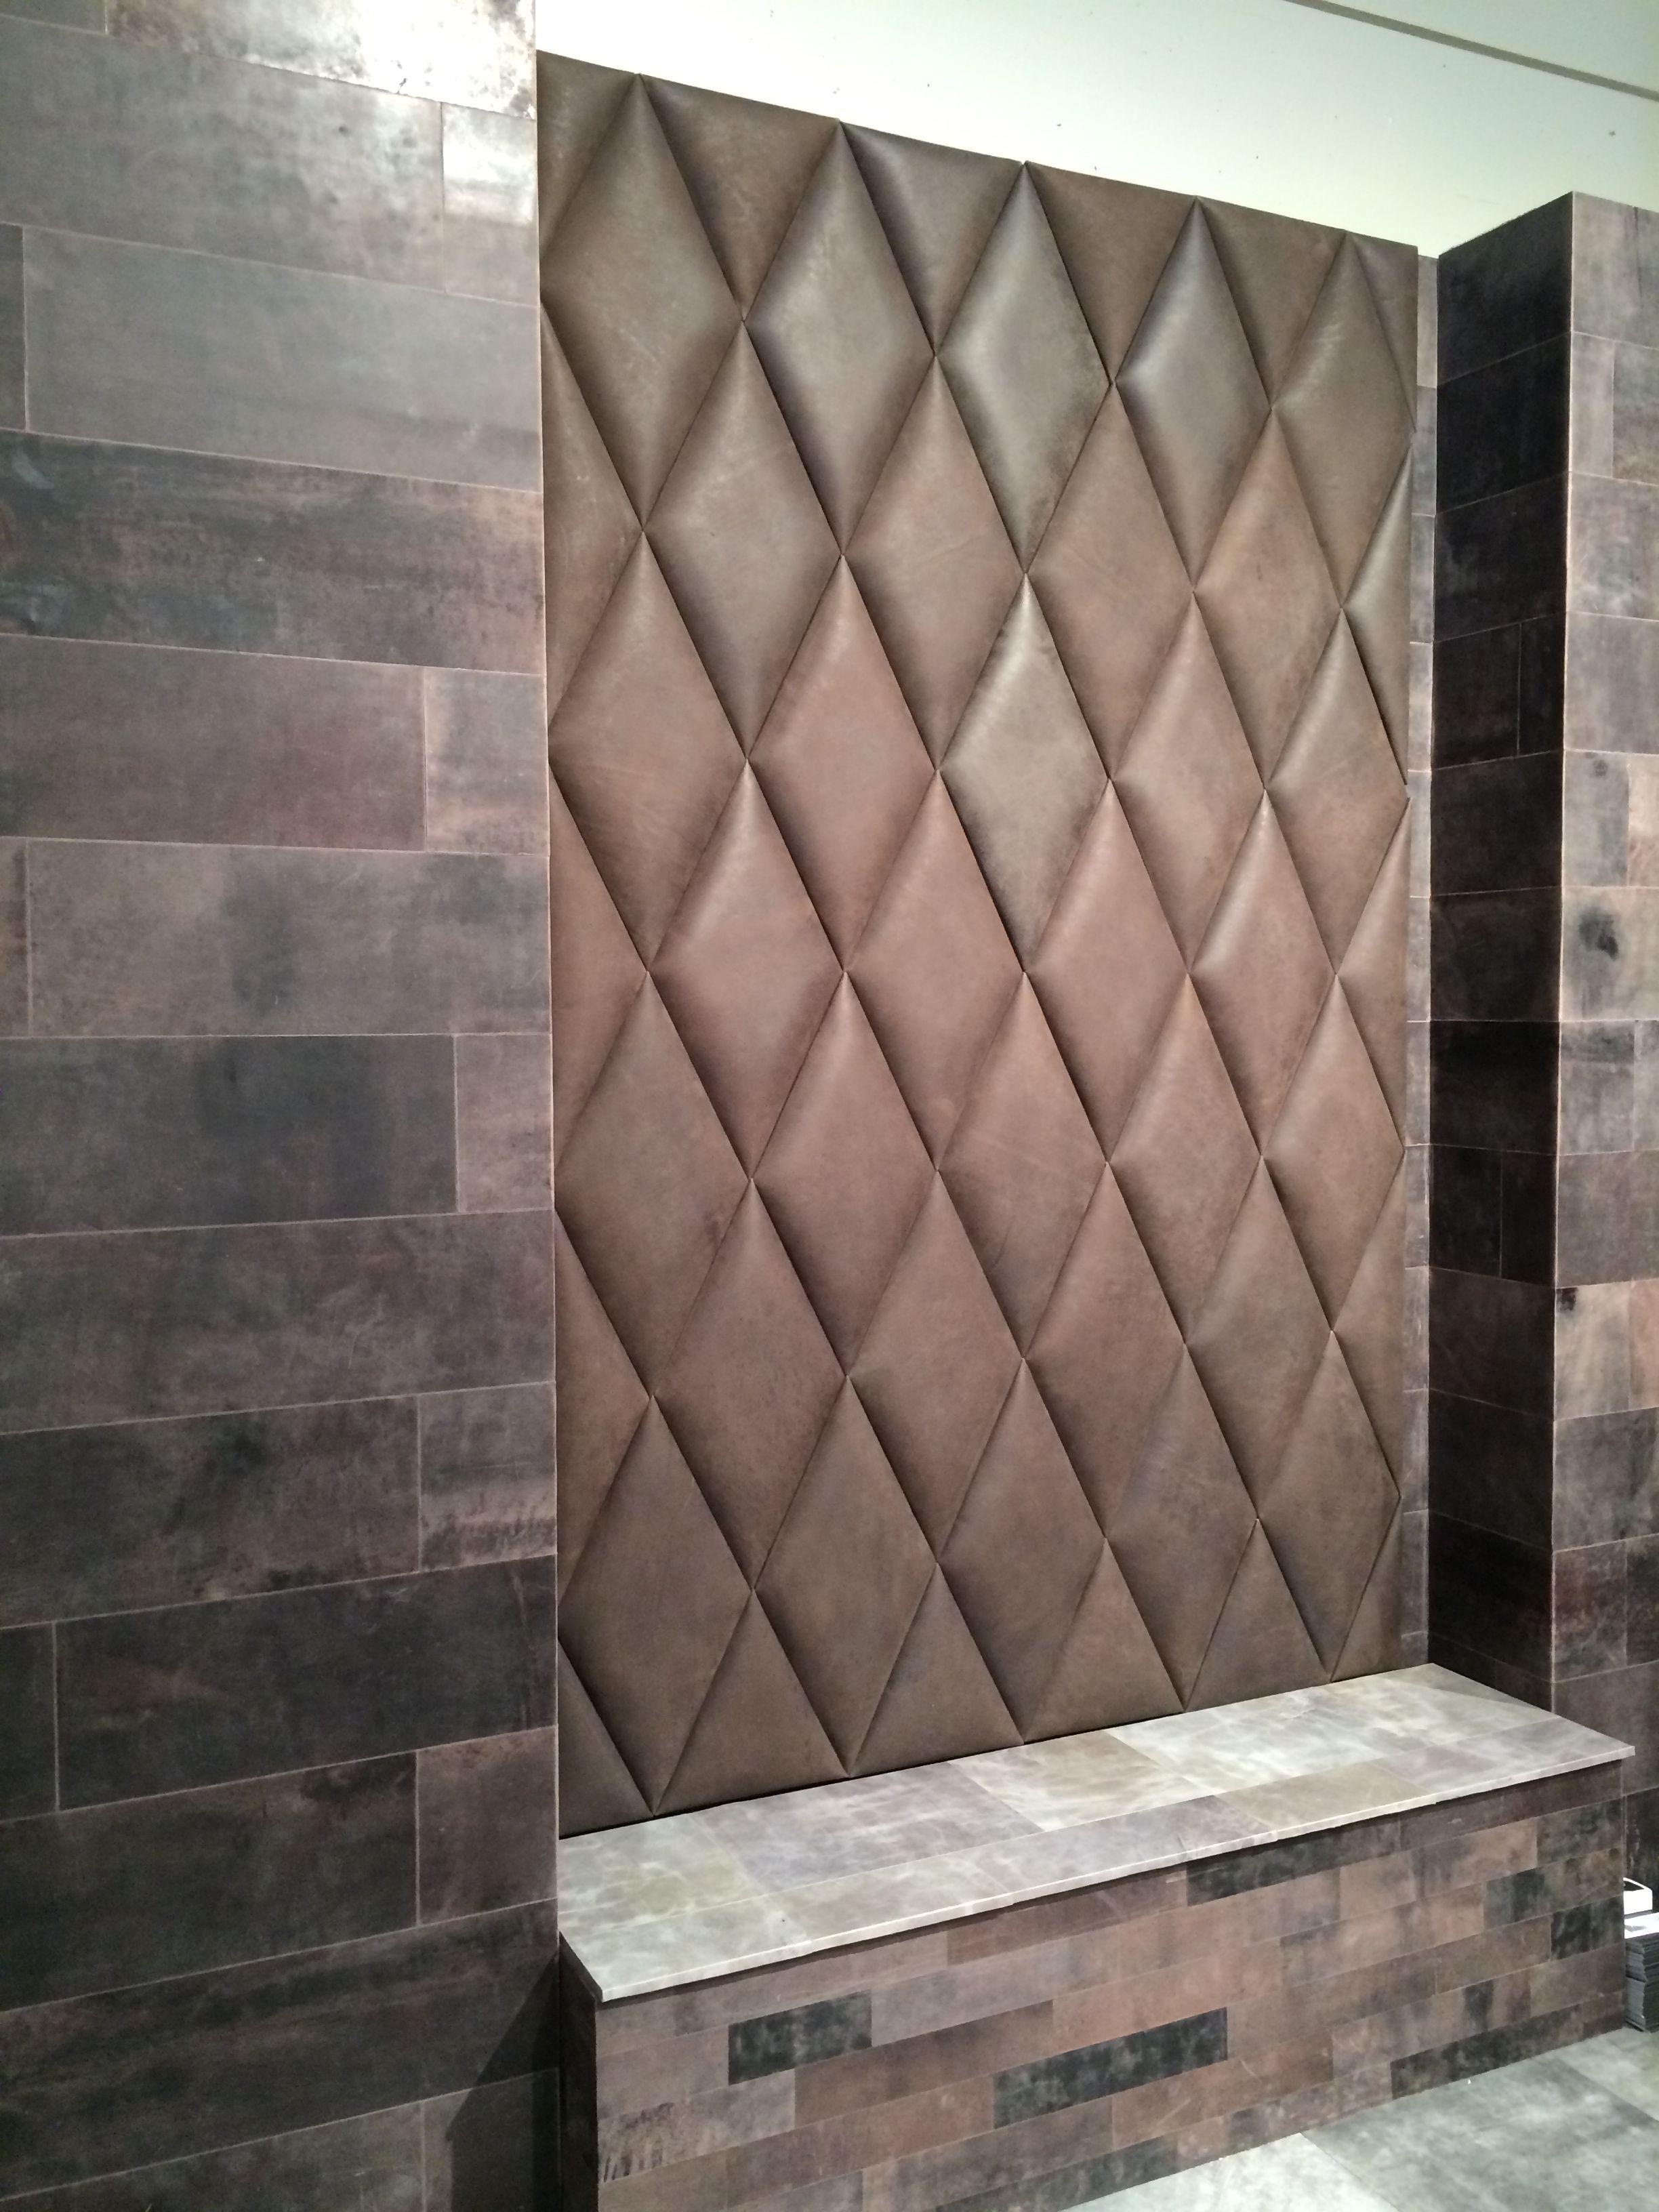 leather wallpaper tiles  Diamand shape 3D padded tiles in leather. | HUGS - 3D padded leather ...